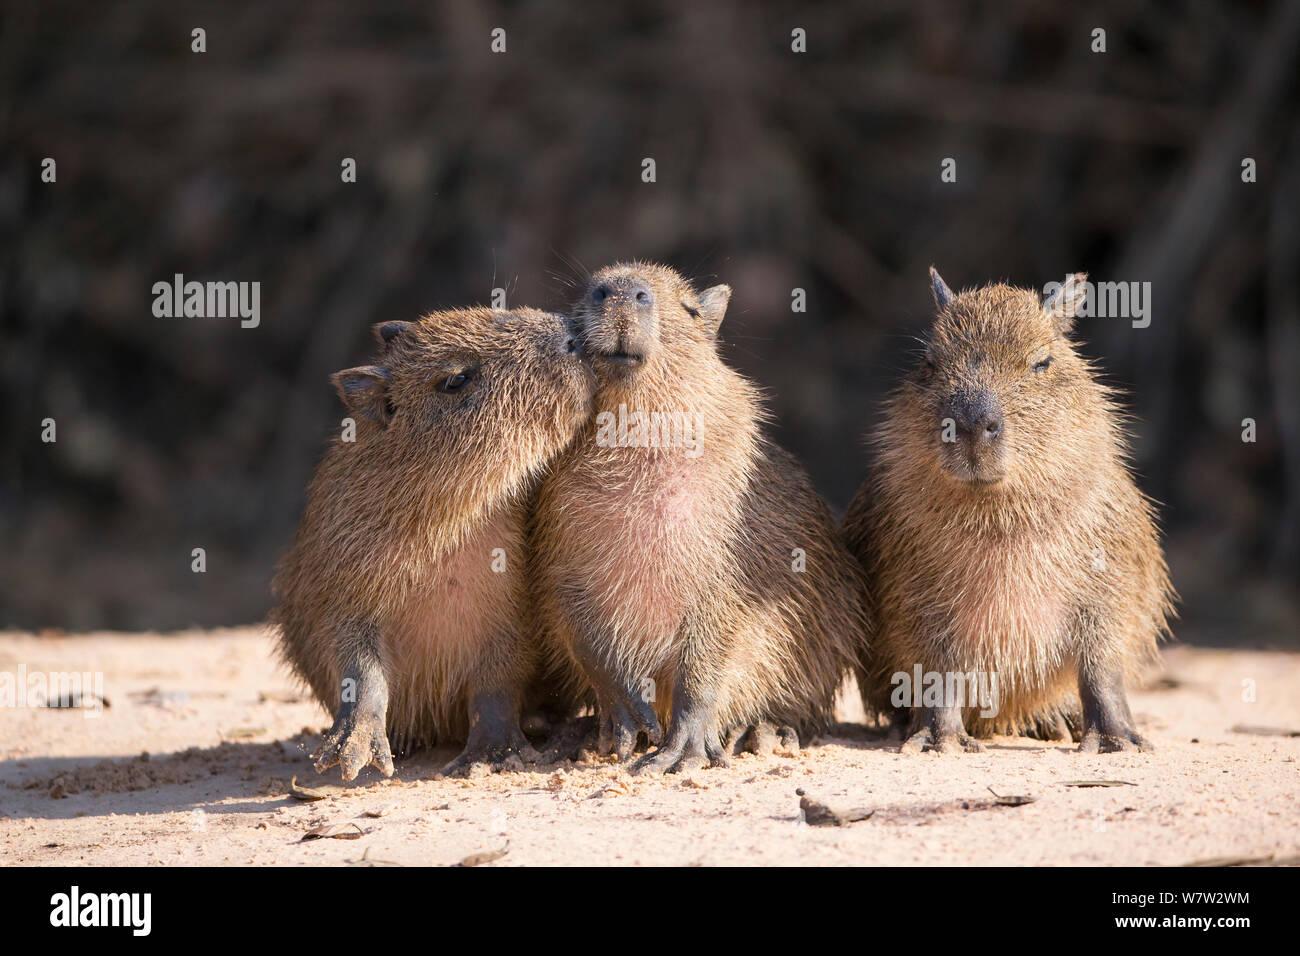 Capybara (Hydrochaeris hydrochaeris) babies Pantanal, Brazil. Stock Photo